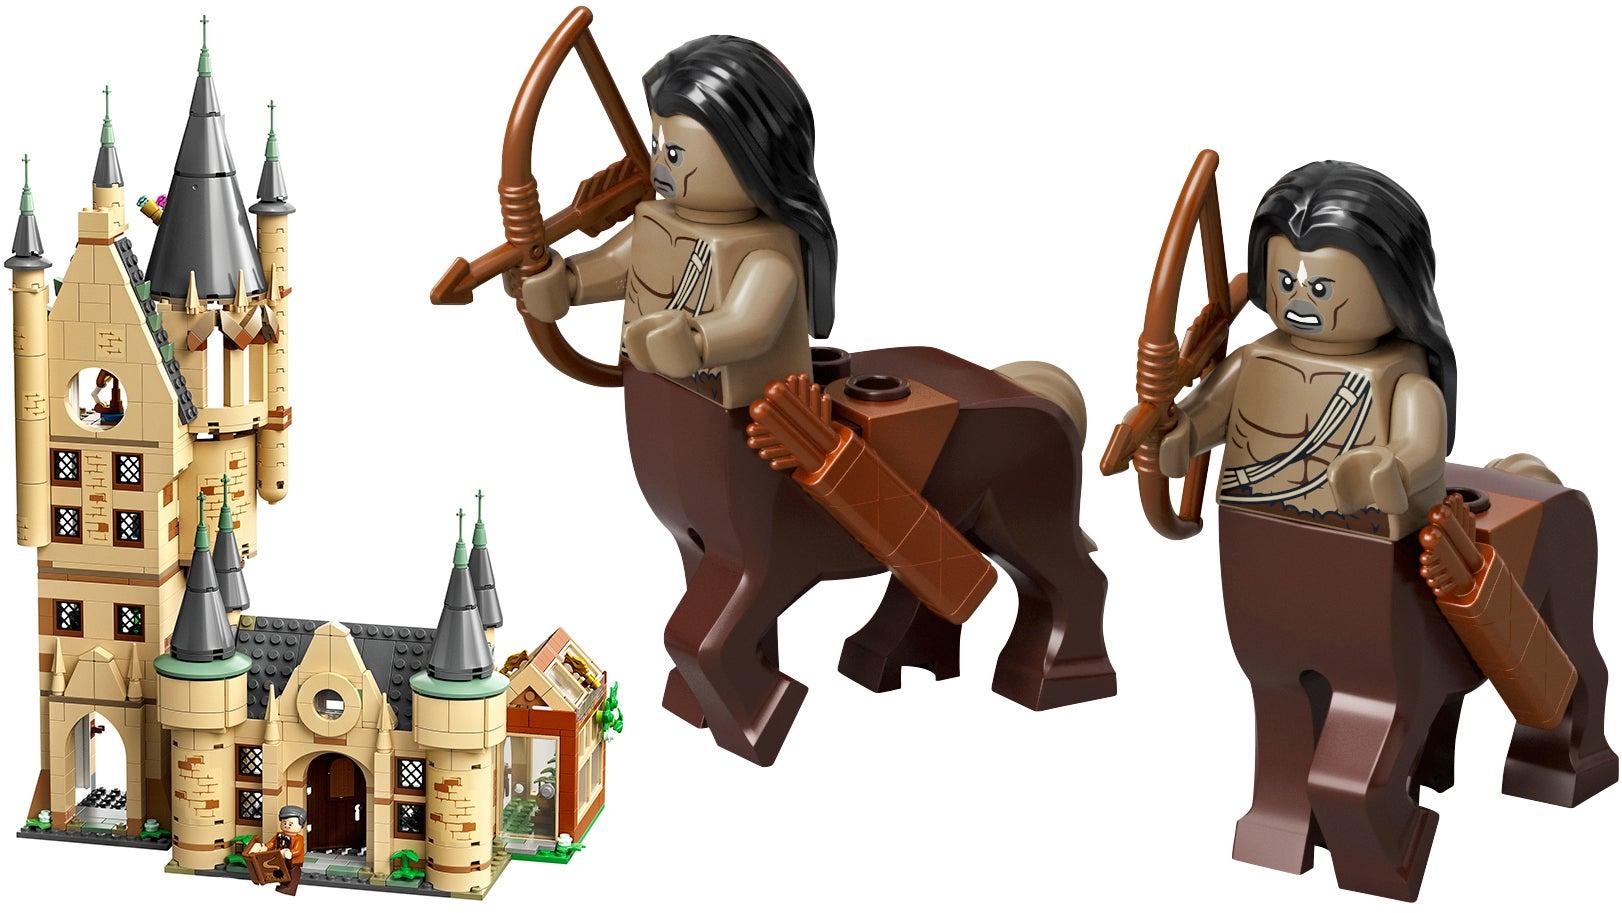 Lego's New Harry Potter Sets Finally Give The World Centaur Minifigures